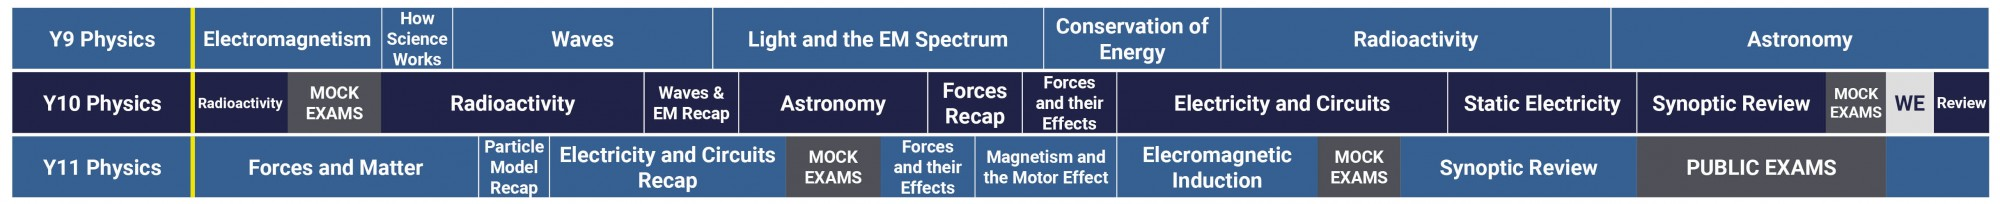 Science Curriculum 2021 2022 GCSE Physics